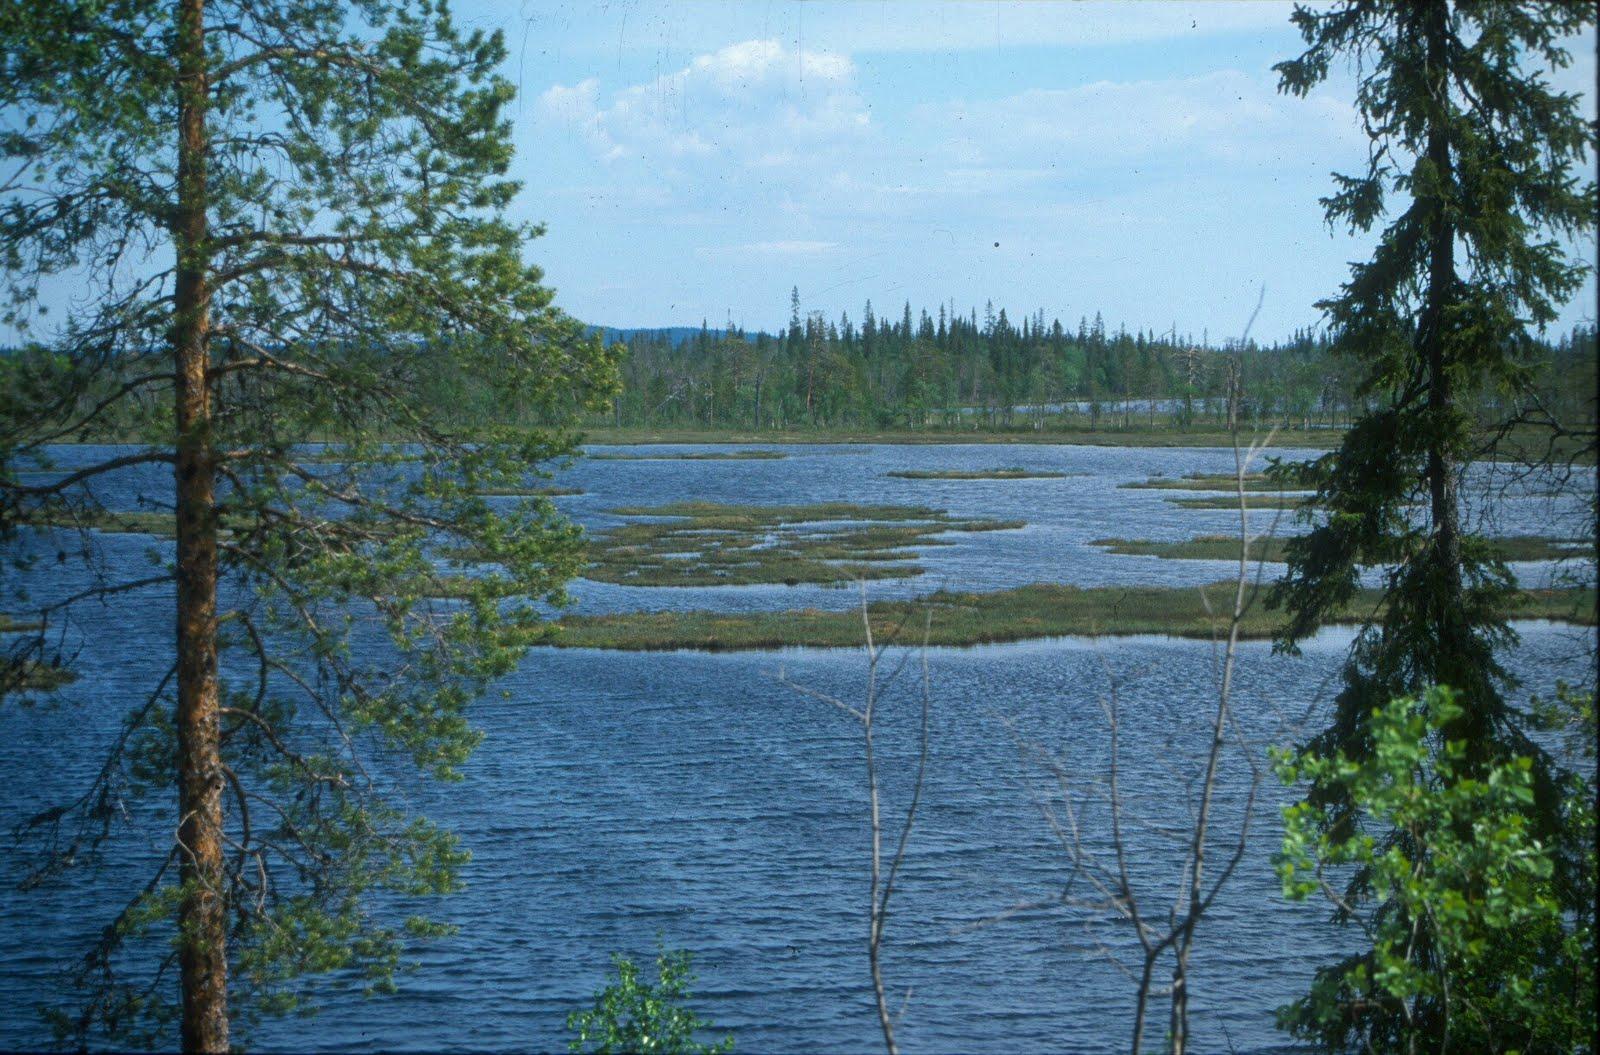 http://1.bp.blogspot.com/-My846YlvQkk/TlxbmCzR25I/AAAAAAAACjc/BmiIirnZgzg/s1600/BorealLake_Finland.jpg